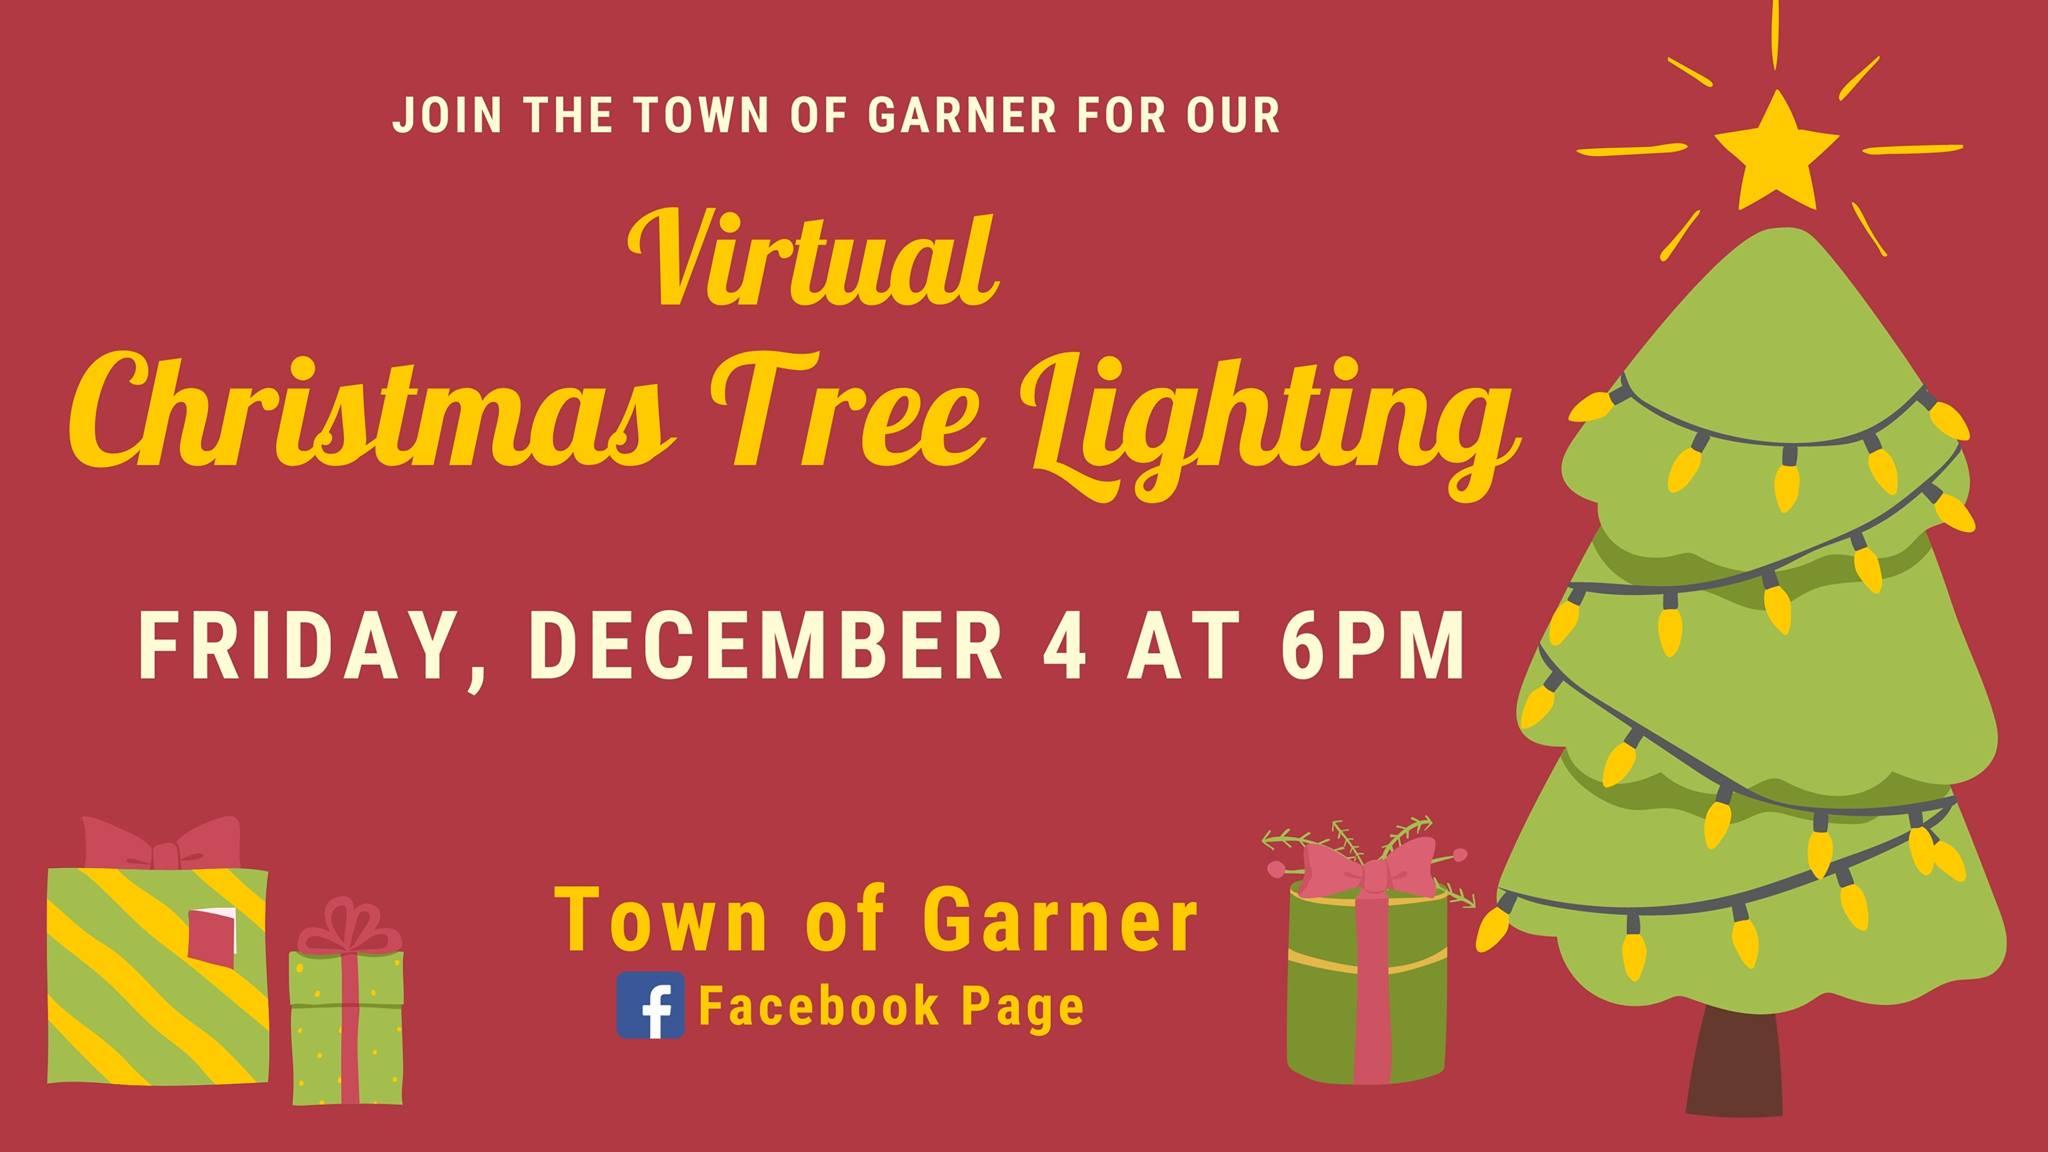 Community Builders Christmas Town 2021 Craft Fair Garner Events Archives Downtown Garner